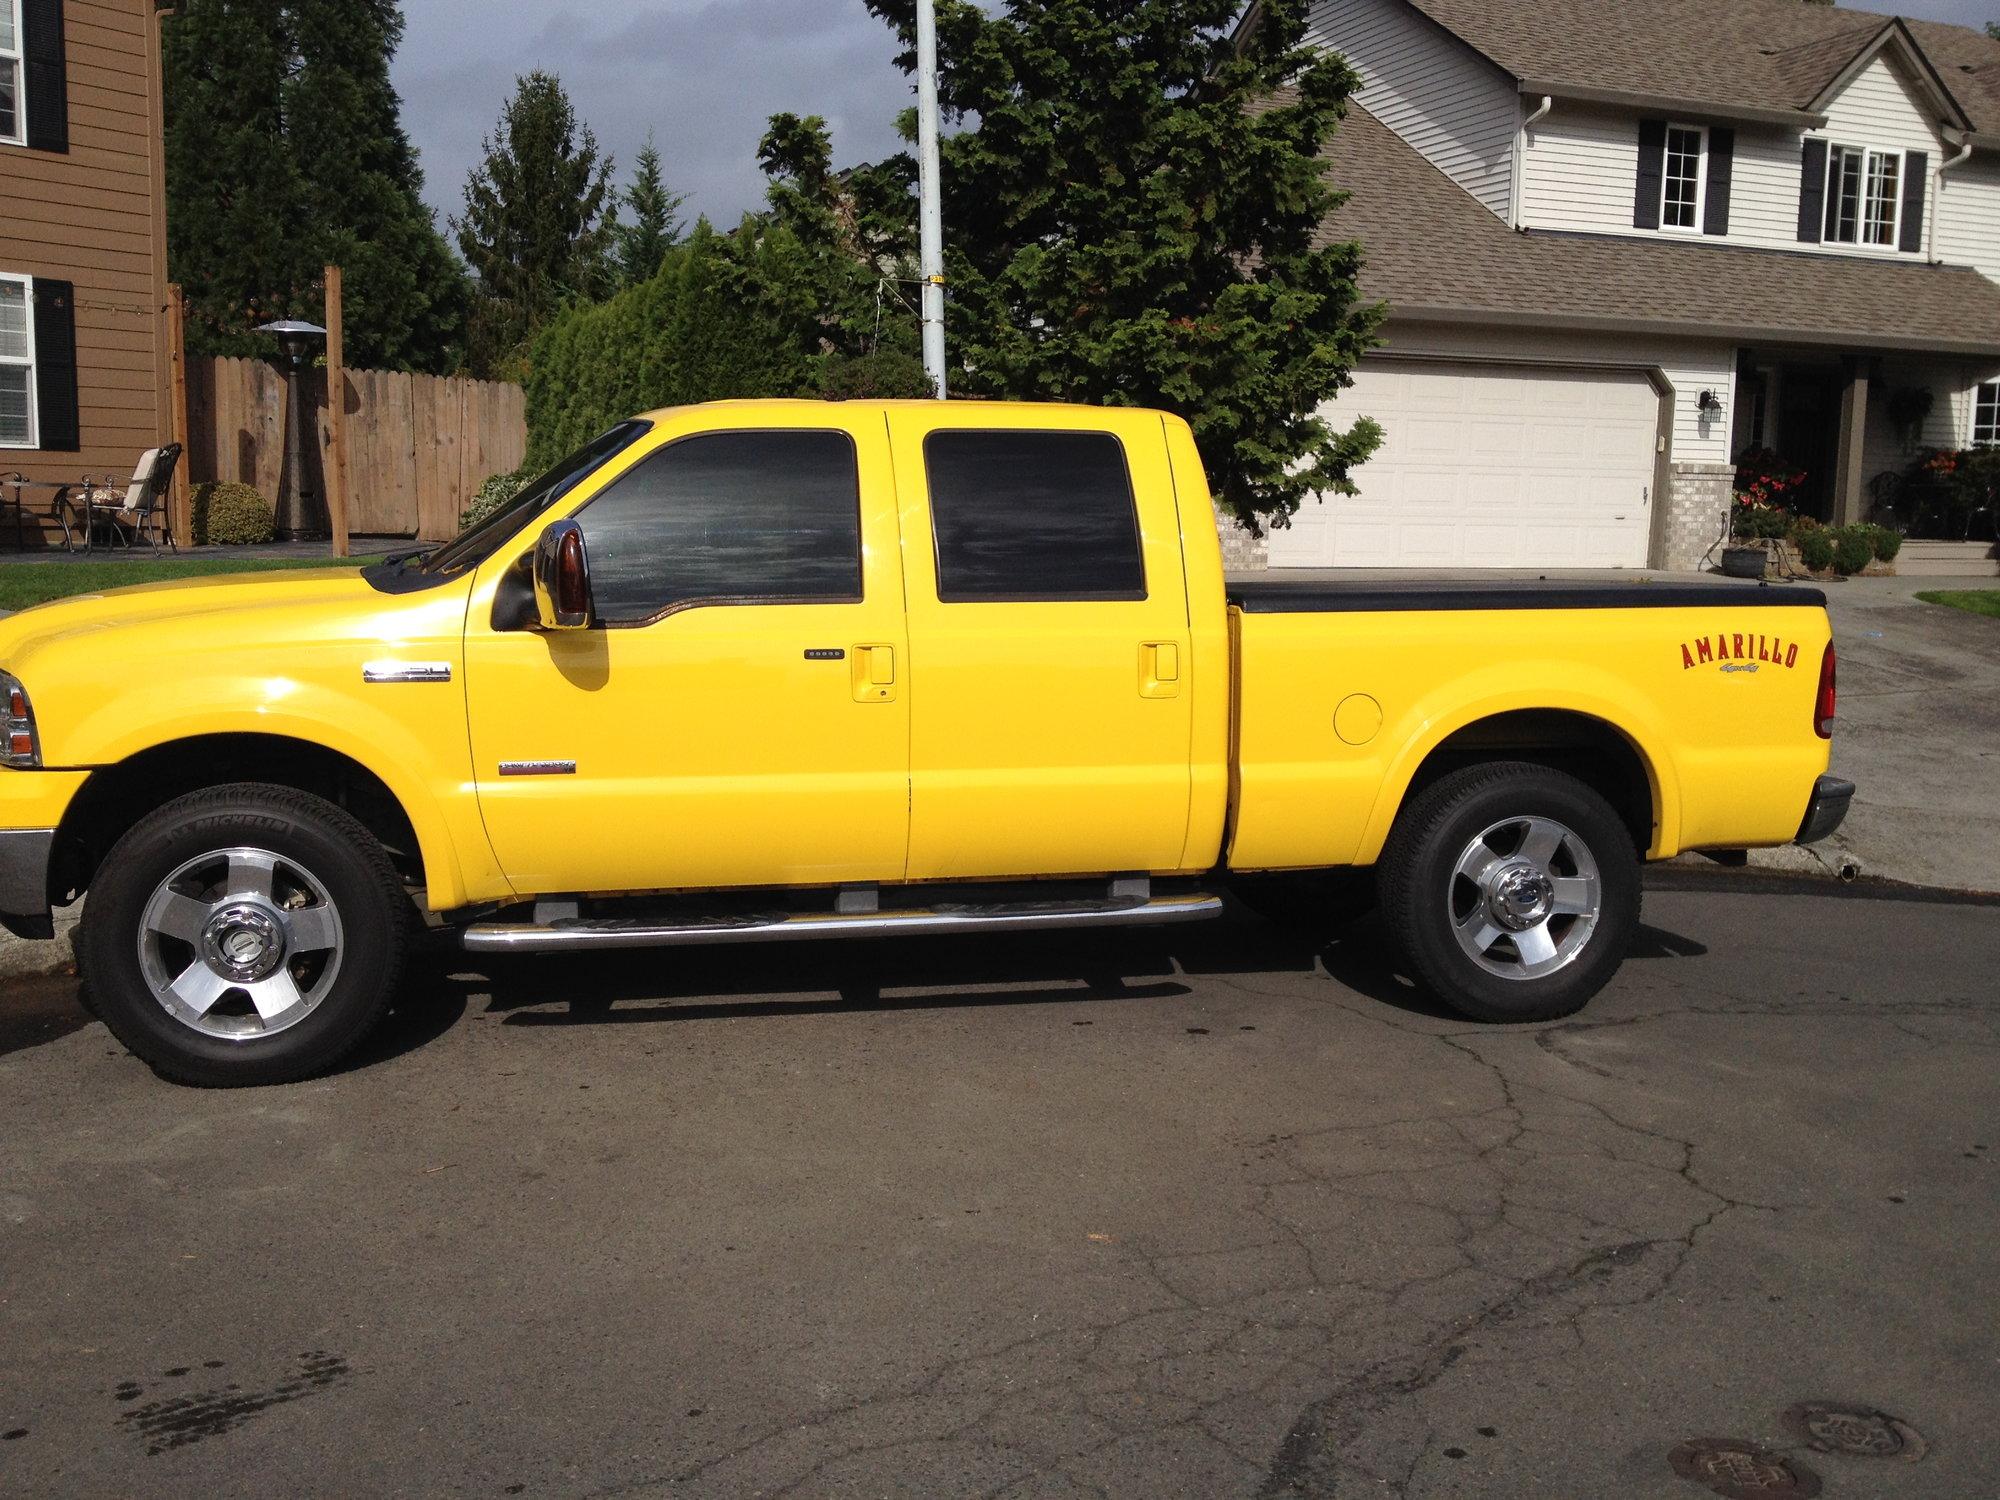 2006 F250 Amarillo Crew, Blazing Yellow Beauty - Ford ...